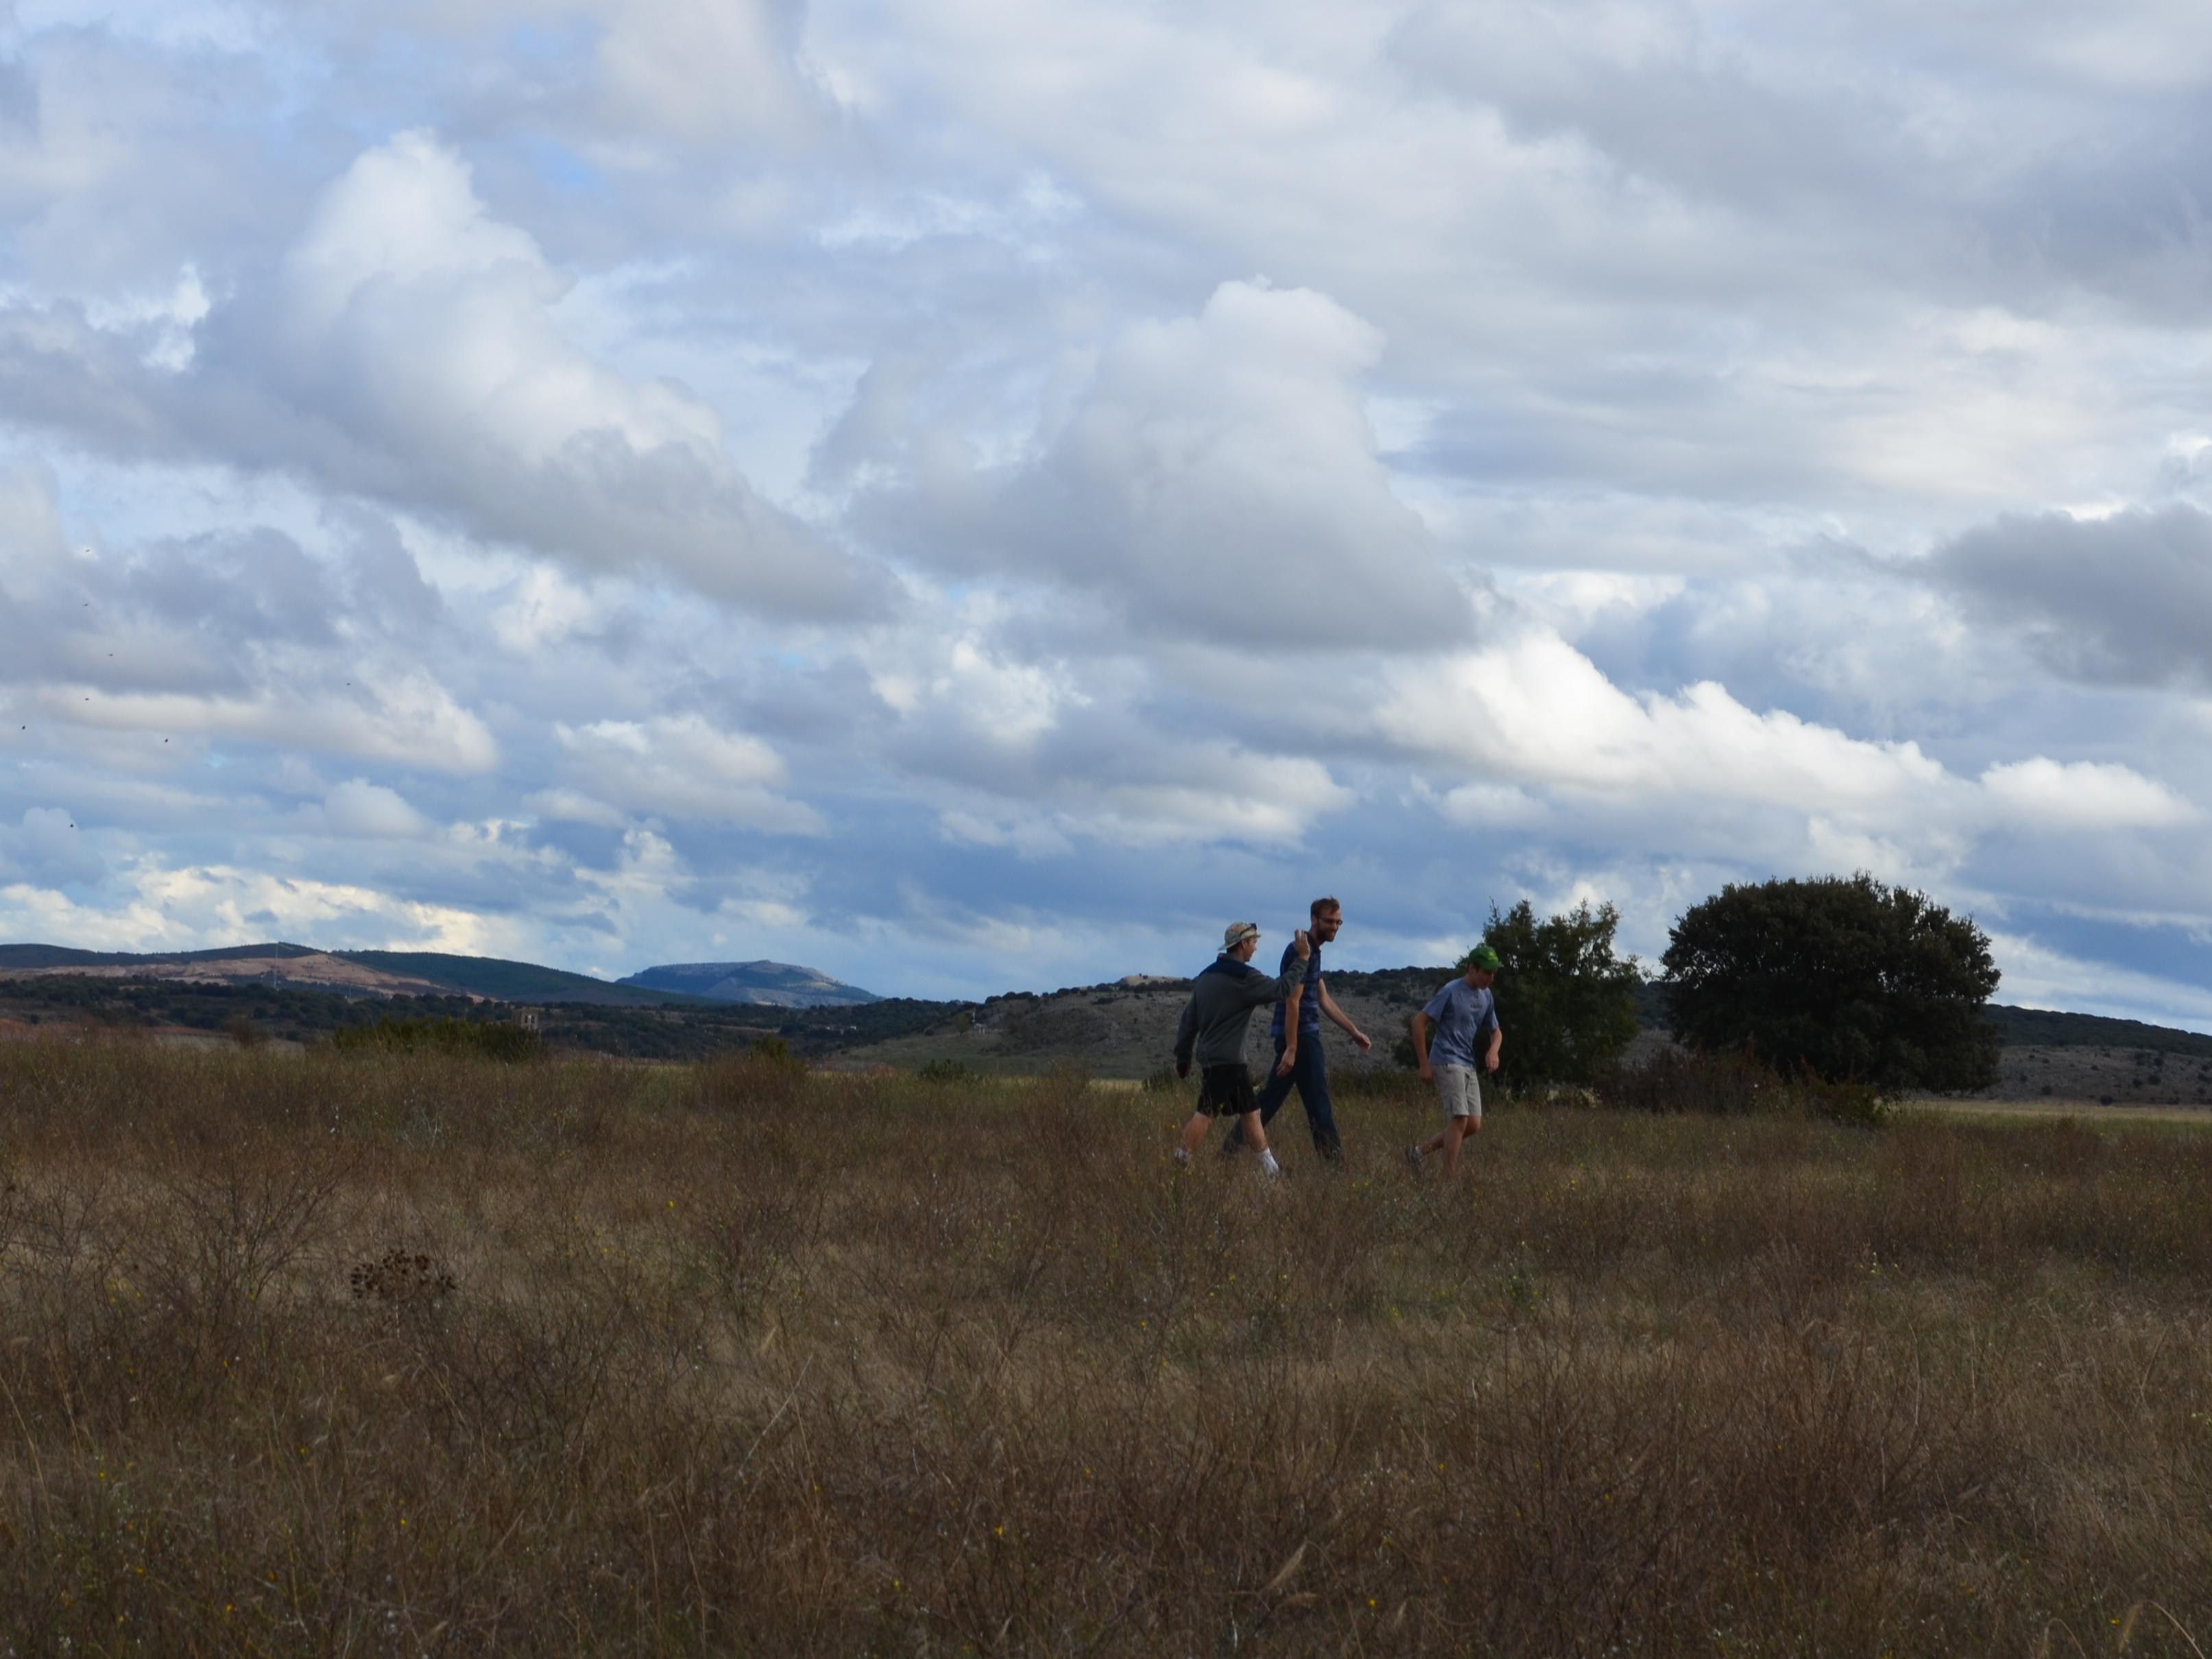 Proctor en Segovia visits wind farm experiential education